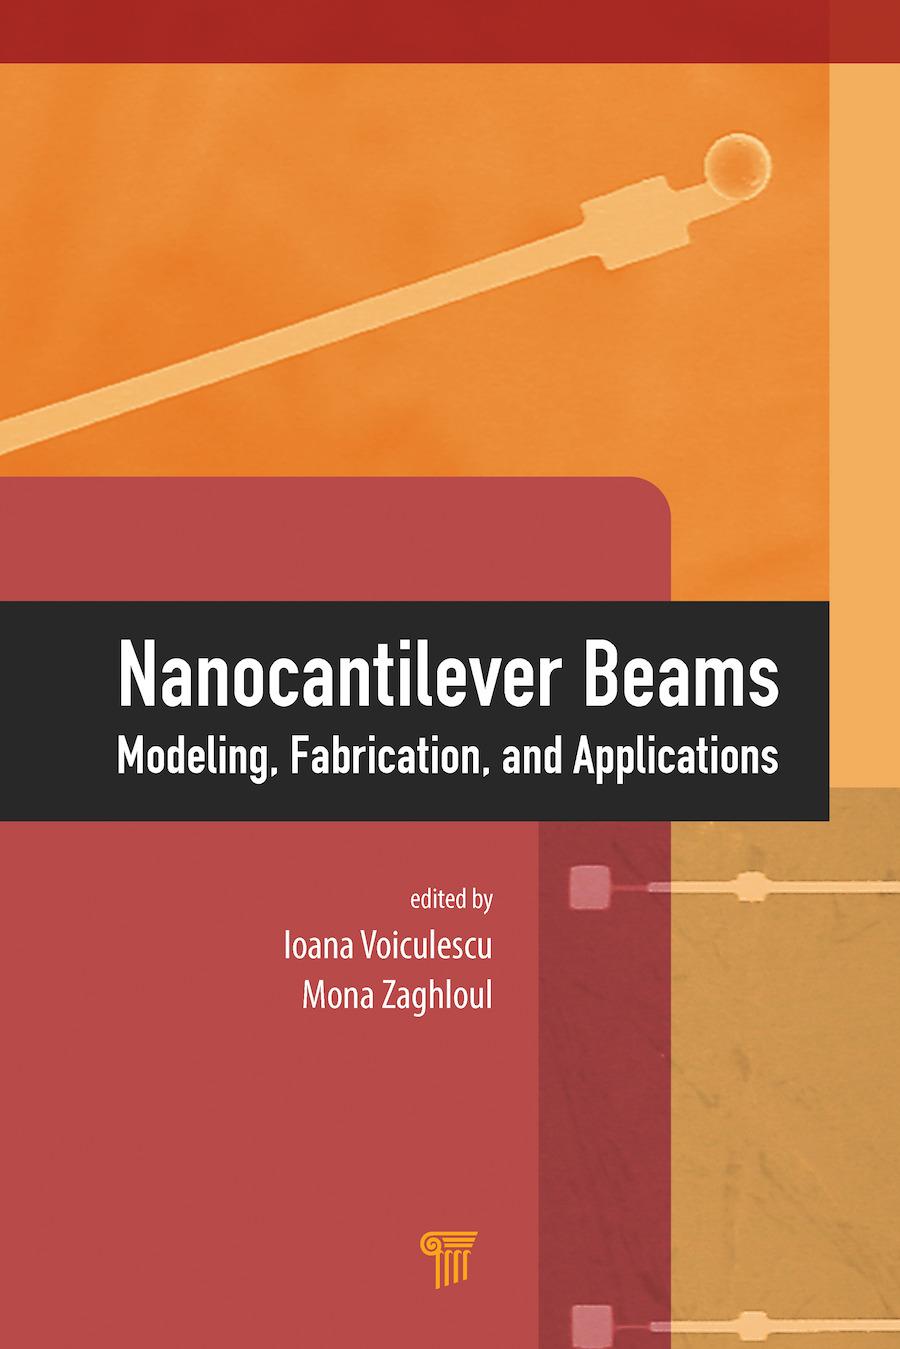 Nanocantilever Beams